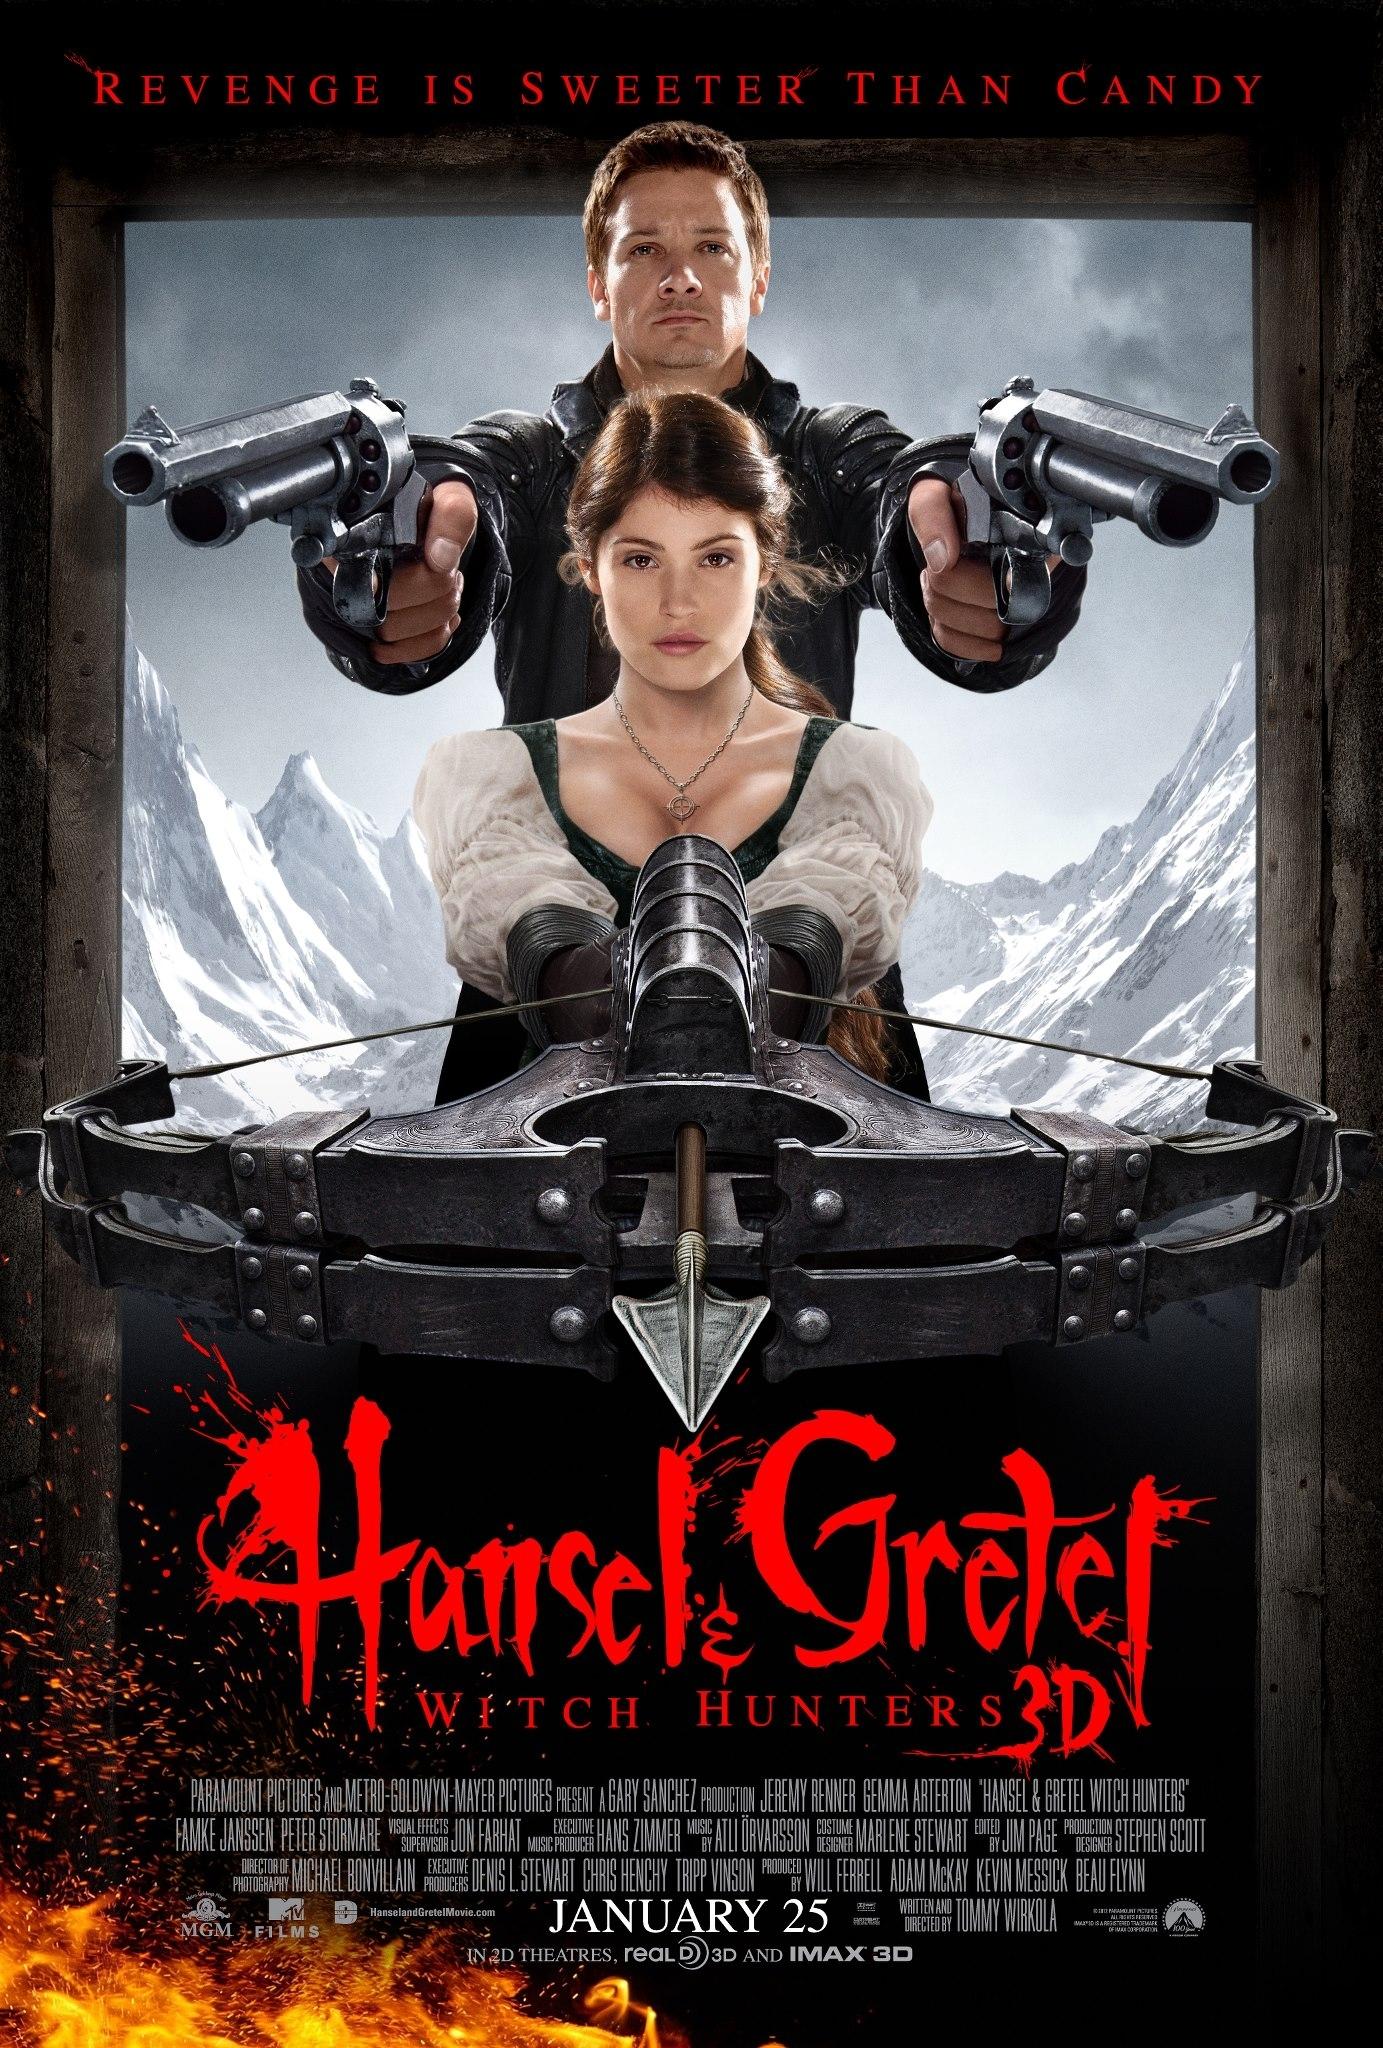 Hansel & Gretel: Witch Hunters - Movie Poster #2 (Original)